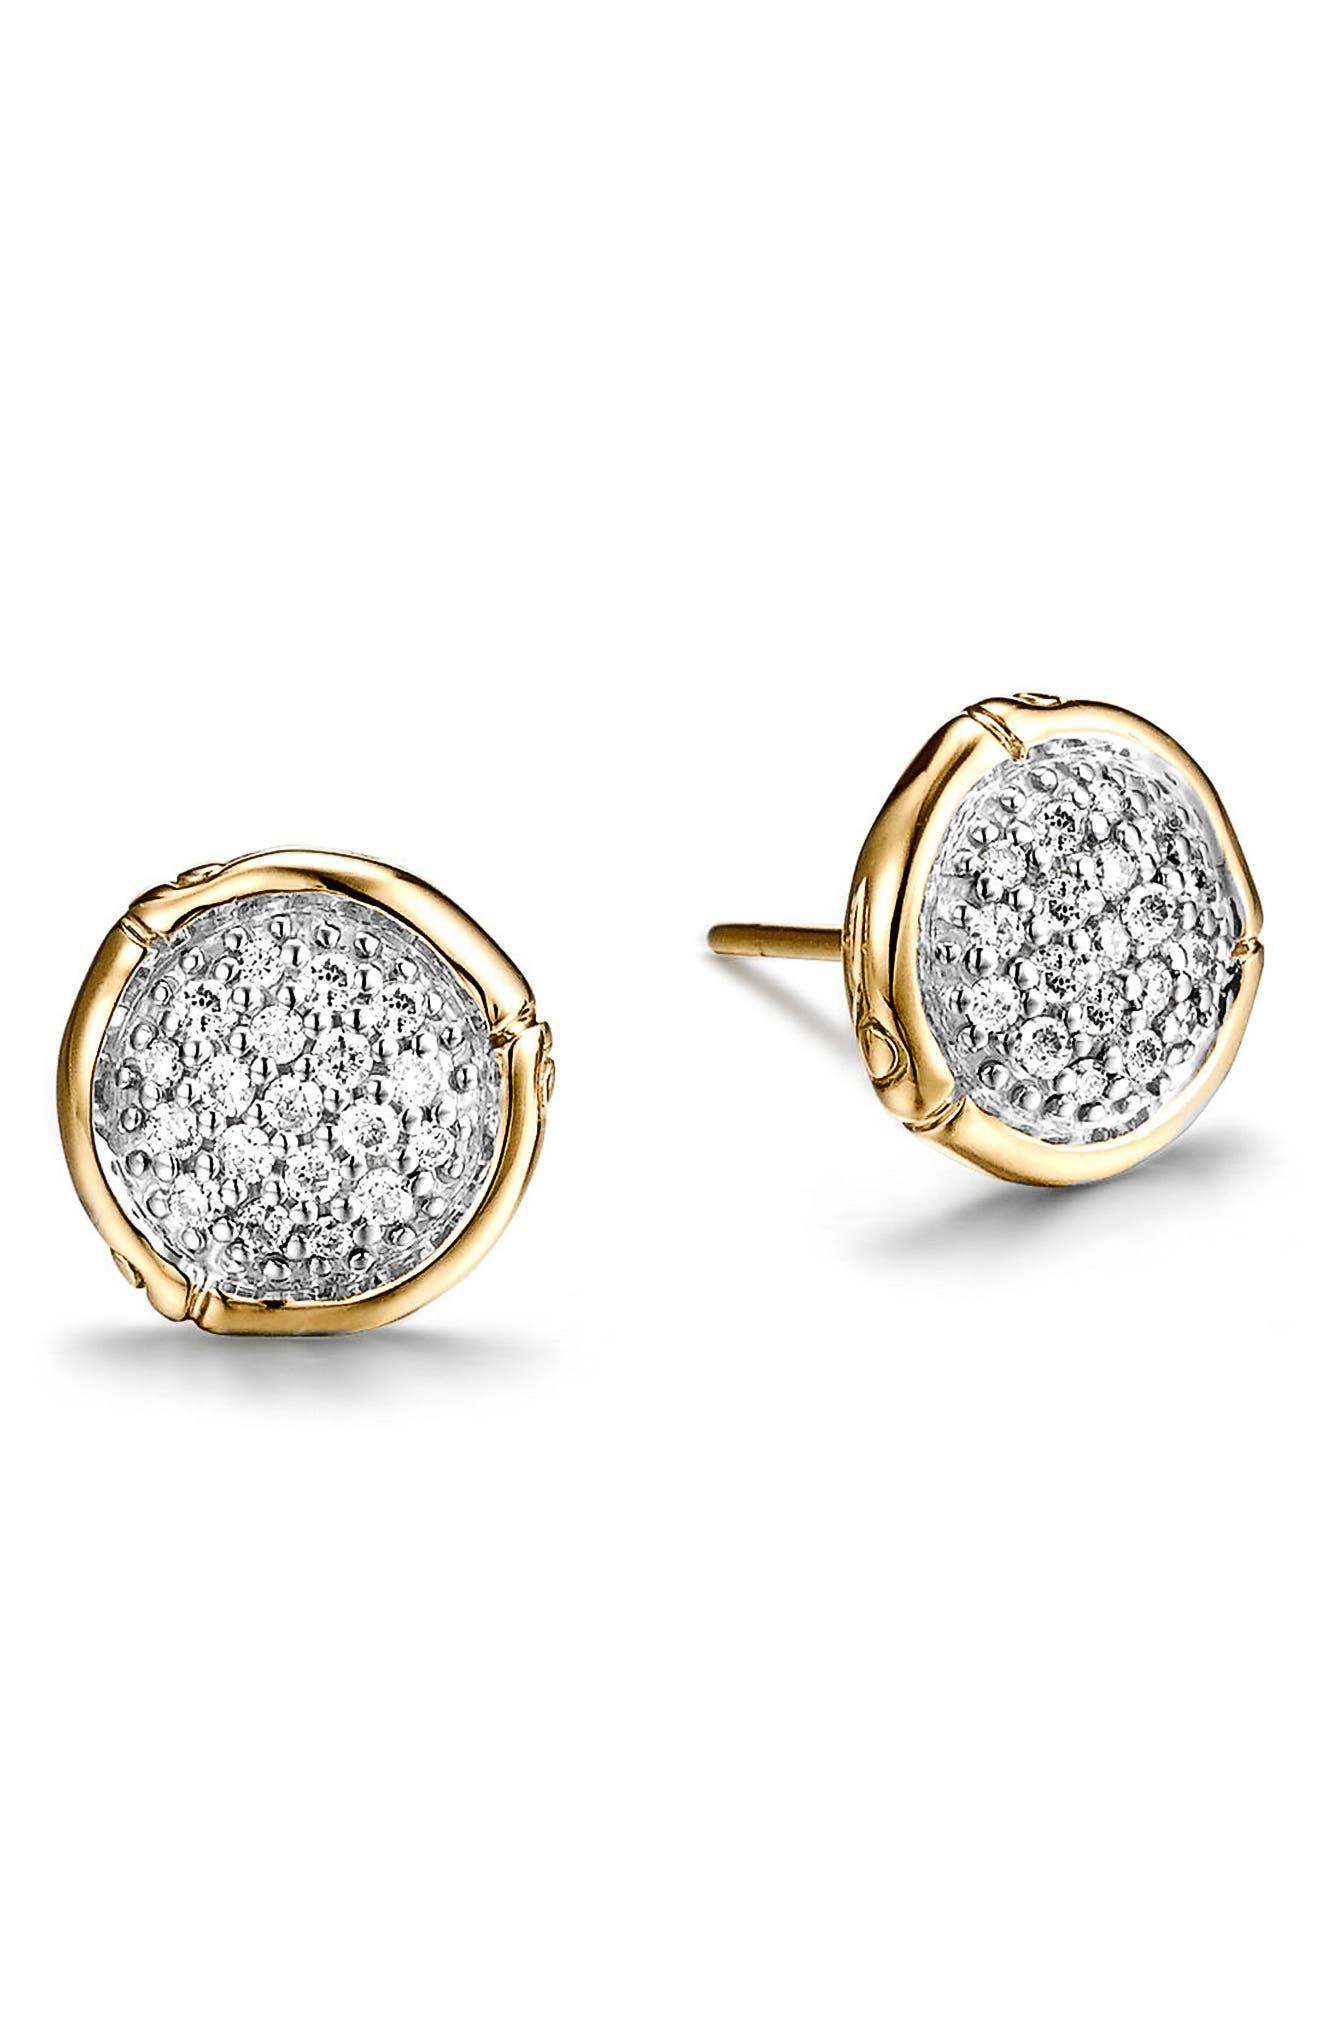 Bamboo Diamond & 18k Gold Stud Earrings,                             Main thumbnail 1, color,                             GOLD